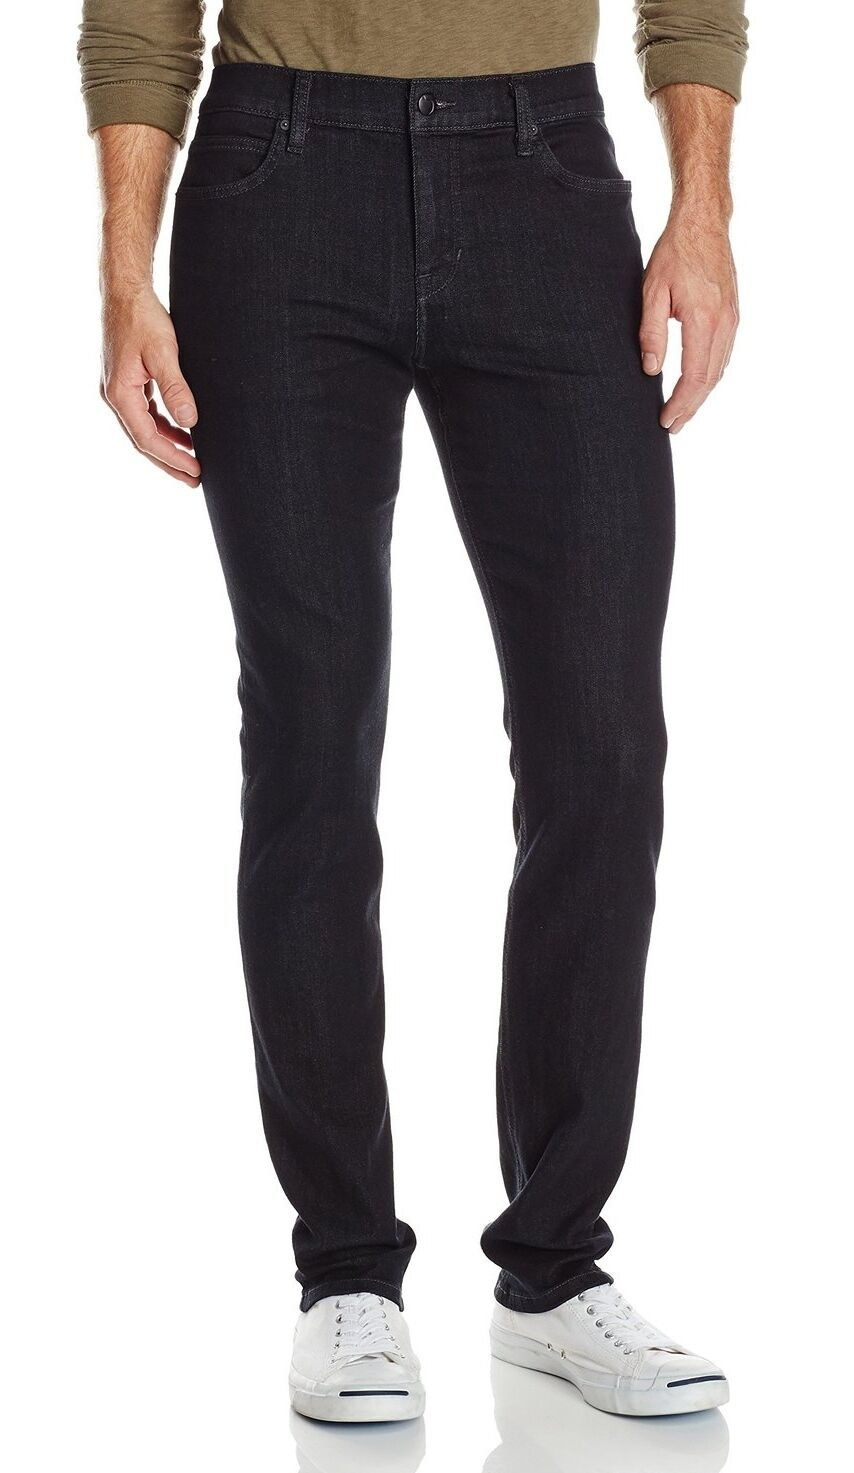 Joe's Jeans Fahrenheit Slim Fit Denim Pants Trousers, Cullen Wash  Nwt